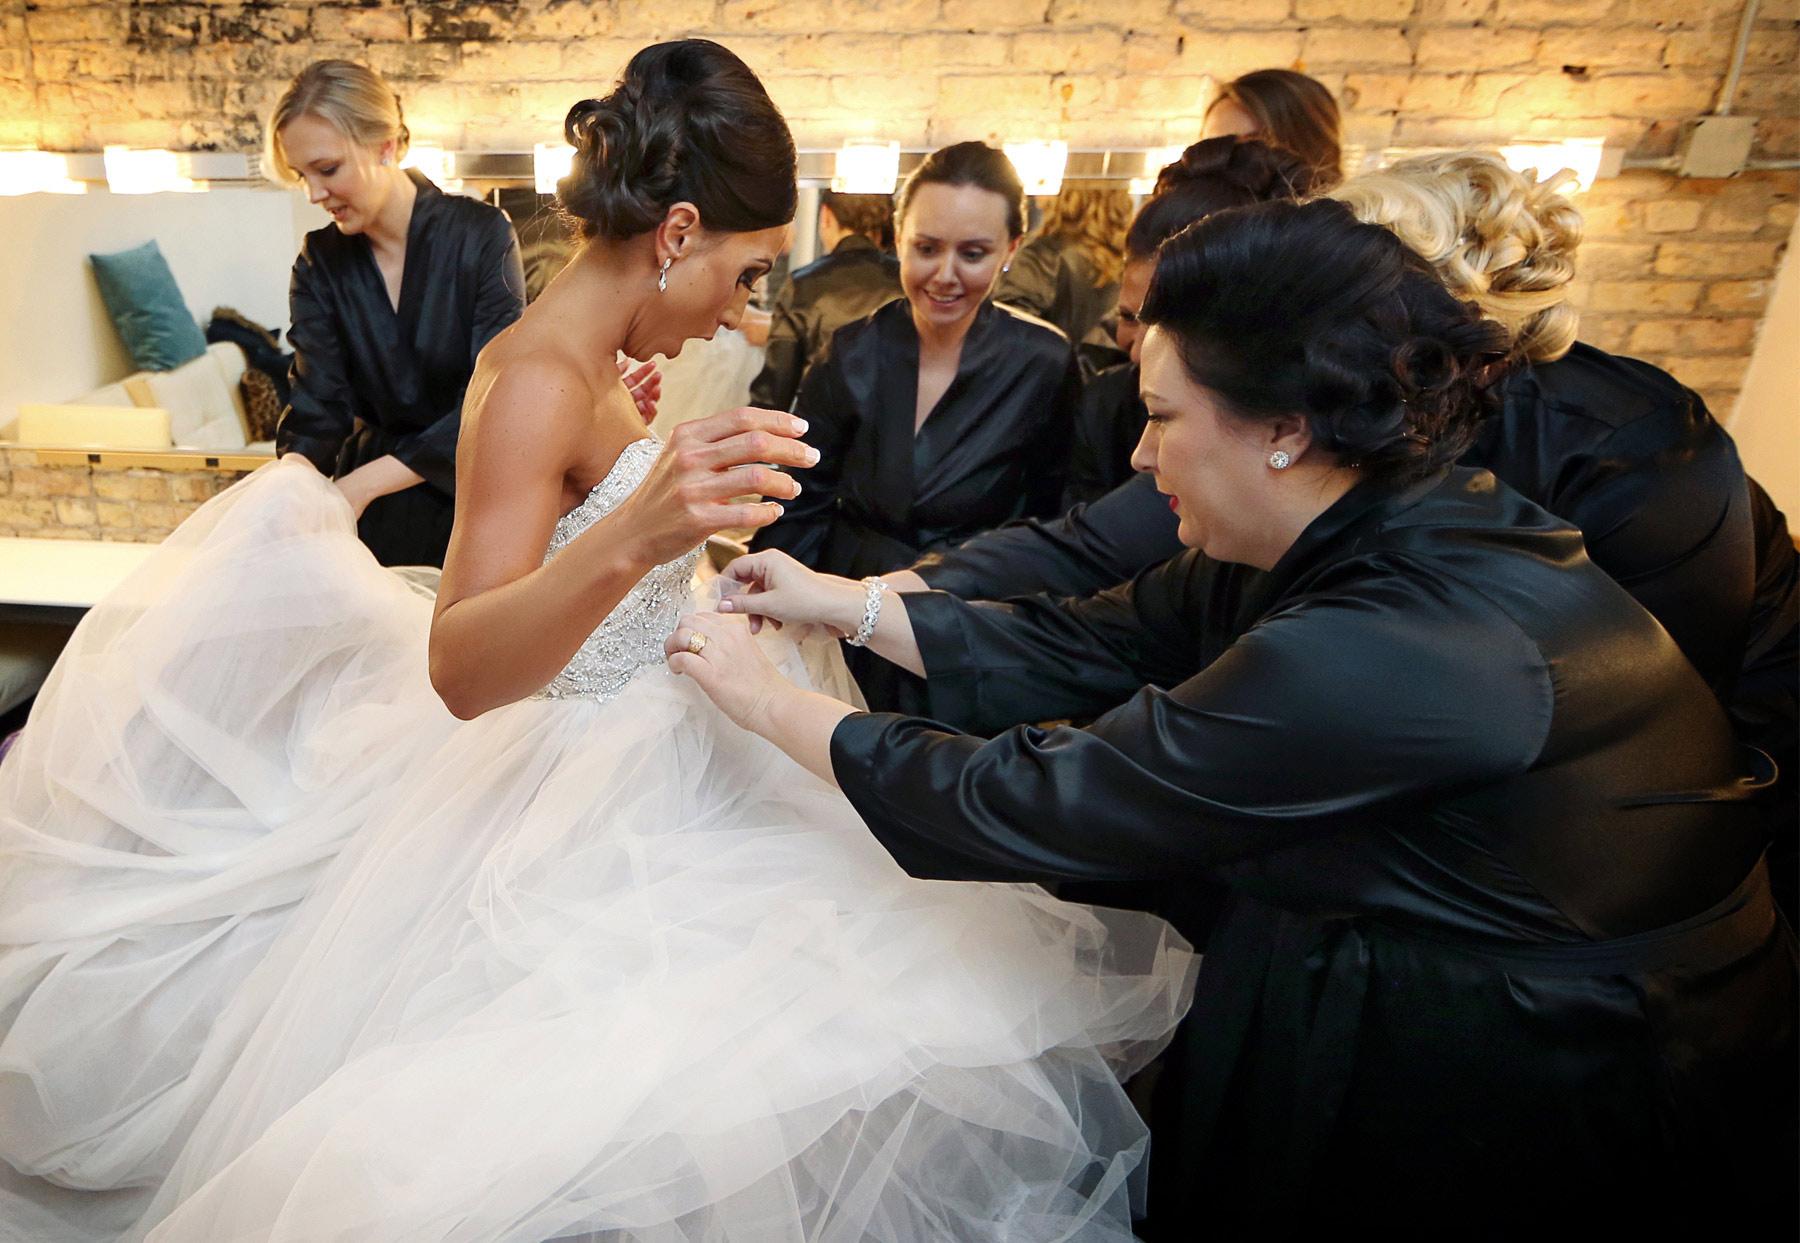 02-Minneapolis-Minnesota-Wedding-Photography-Aria-Downtown-Industrial-Bride-Dress-Melanie-and-Andrew.jpg